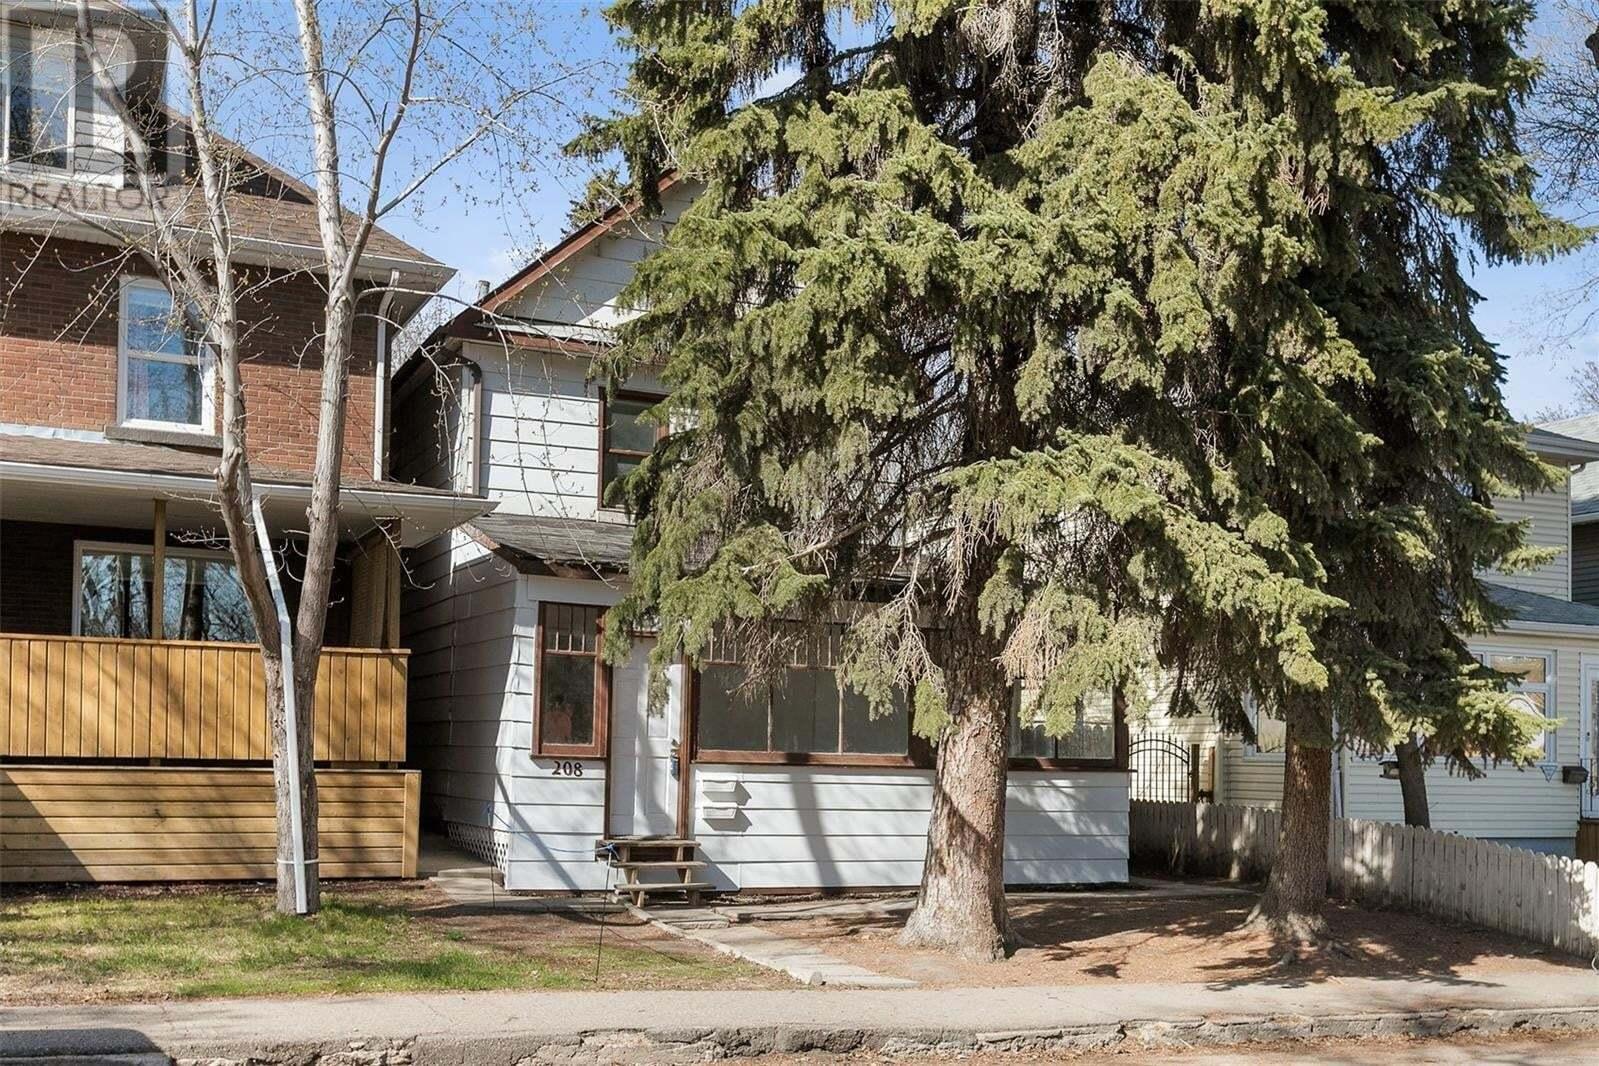 House for sale at 208 26th St W Saskatoon Saskatchewan - MLS: SK815498